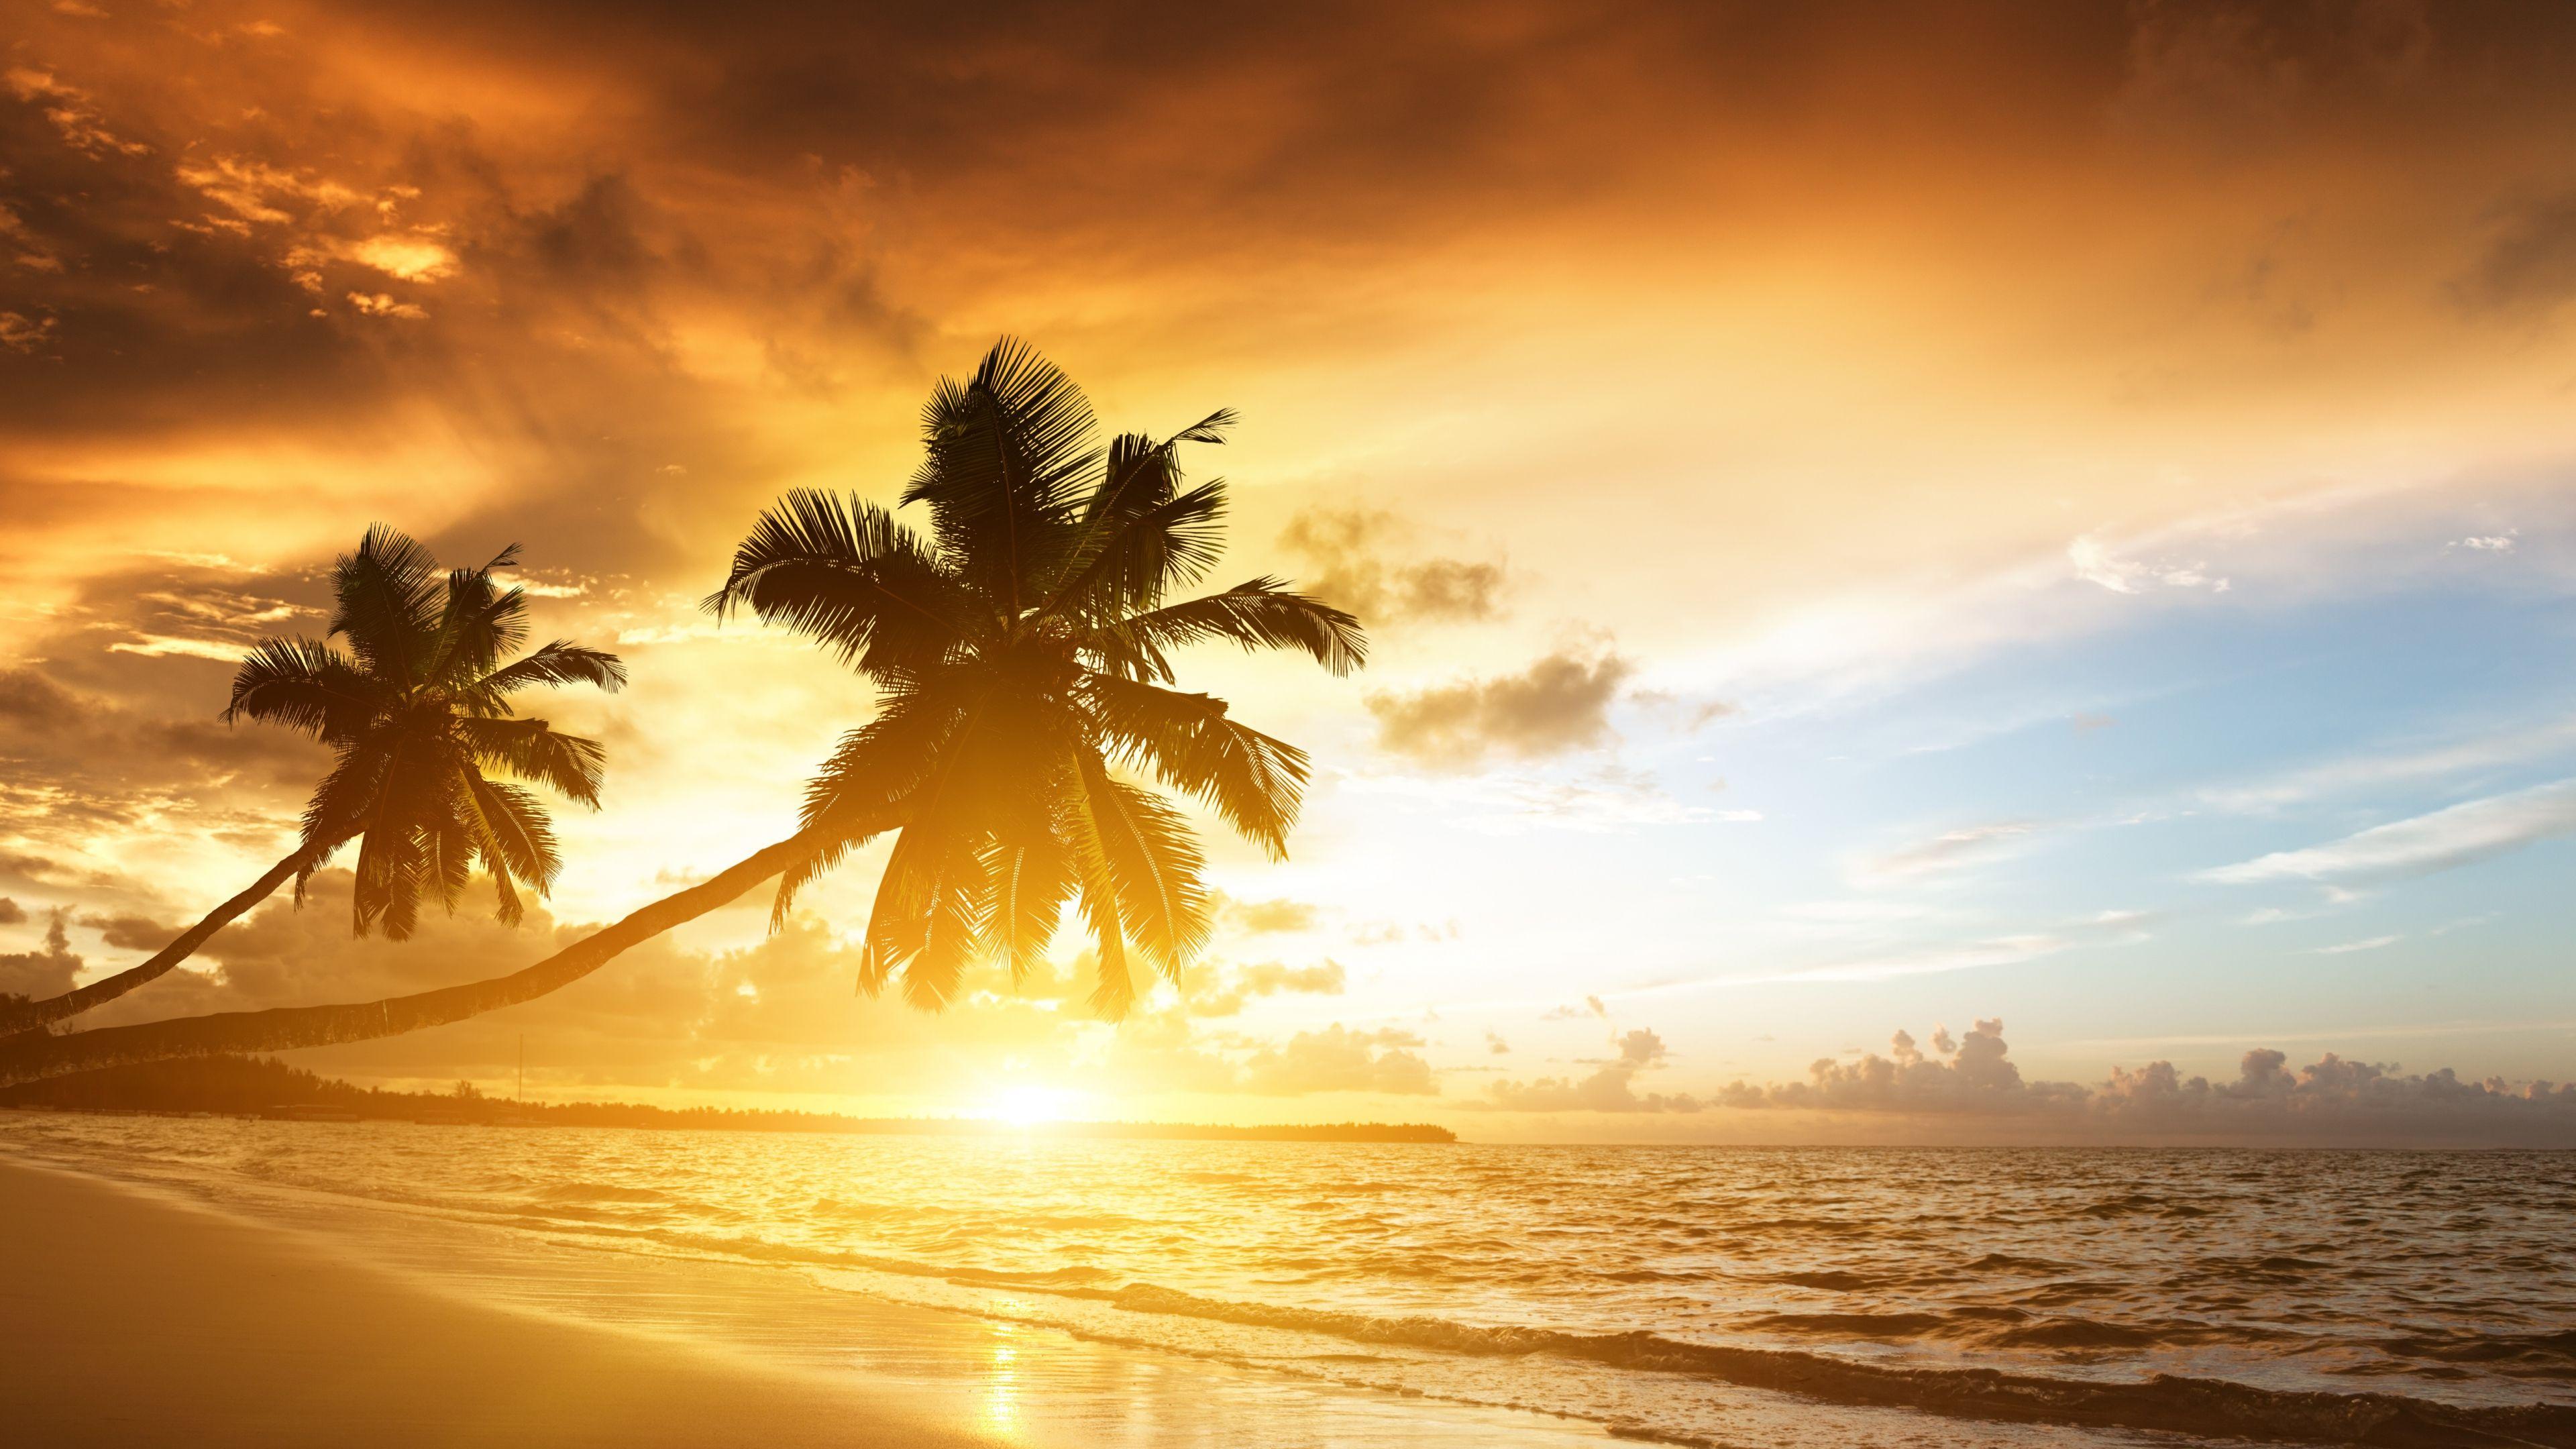 Download Wallpaper 3840x2160 Beach Tropics Sea Sand Palm Trees Sunset Evening 4k Ultra Hd Hd Backgrou Beach Wallpaper Sunrise Wallpaper Sunset Wallpaper